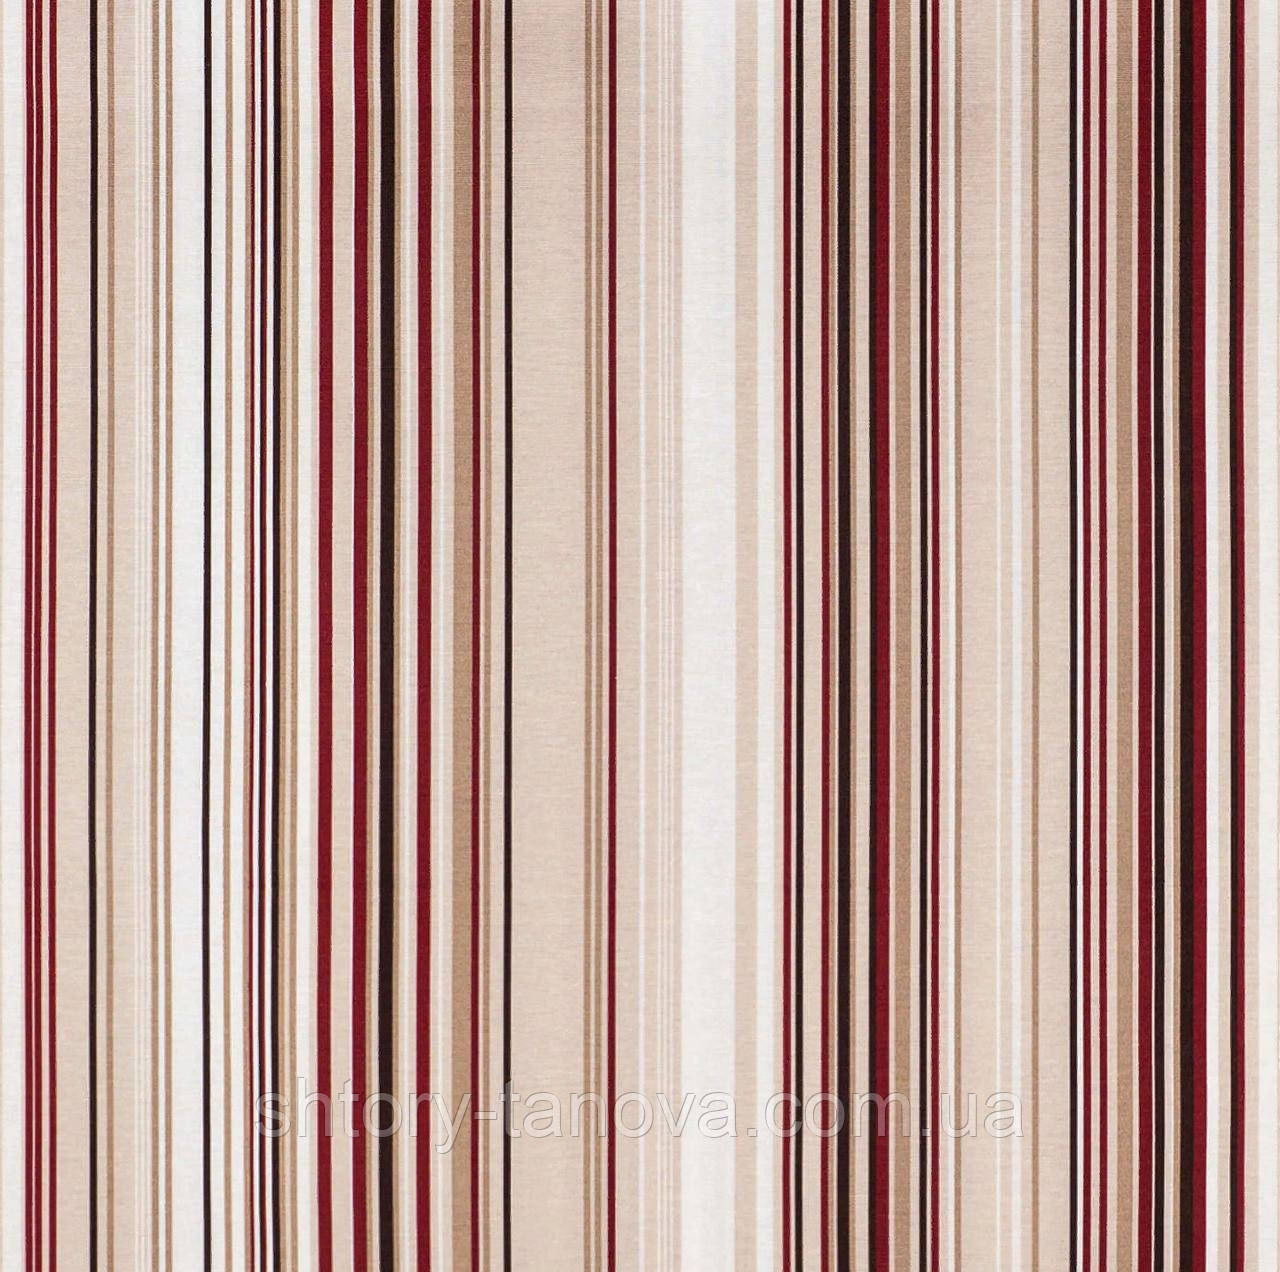 Тканина для штор в стилі прованс в коричнево-червону смугу